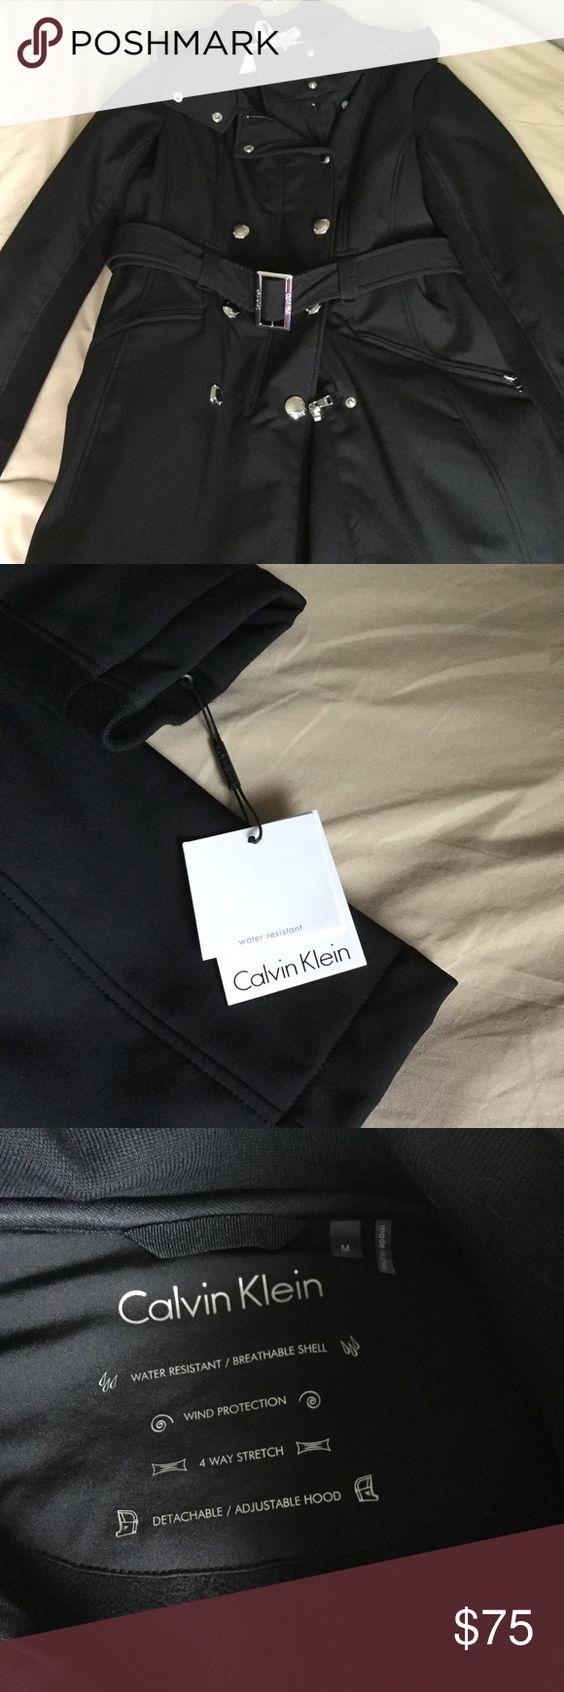 NWT Calvin Klein Coat New Calvin Klein Asymetrical snap collar coat. Stretchy material size Medium Calvin Klein Jackets & Coats Trench Coats